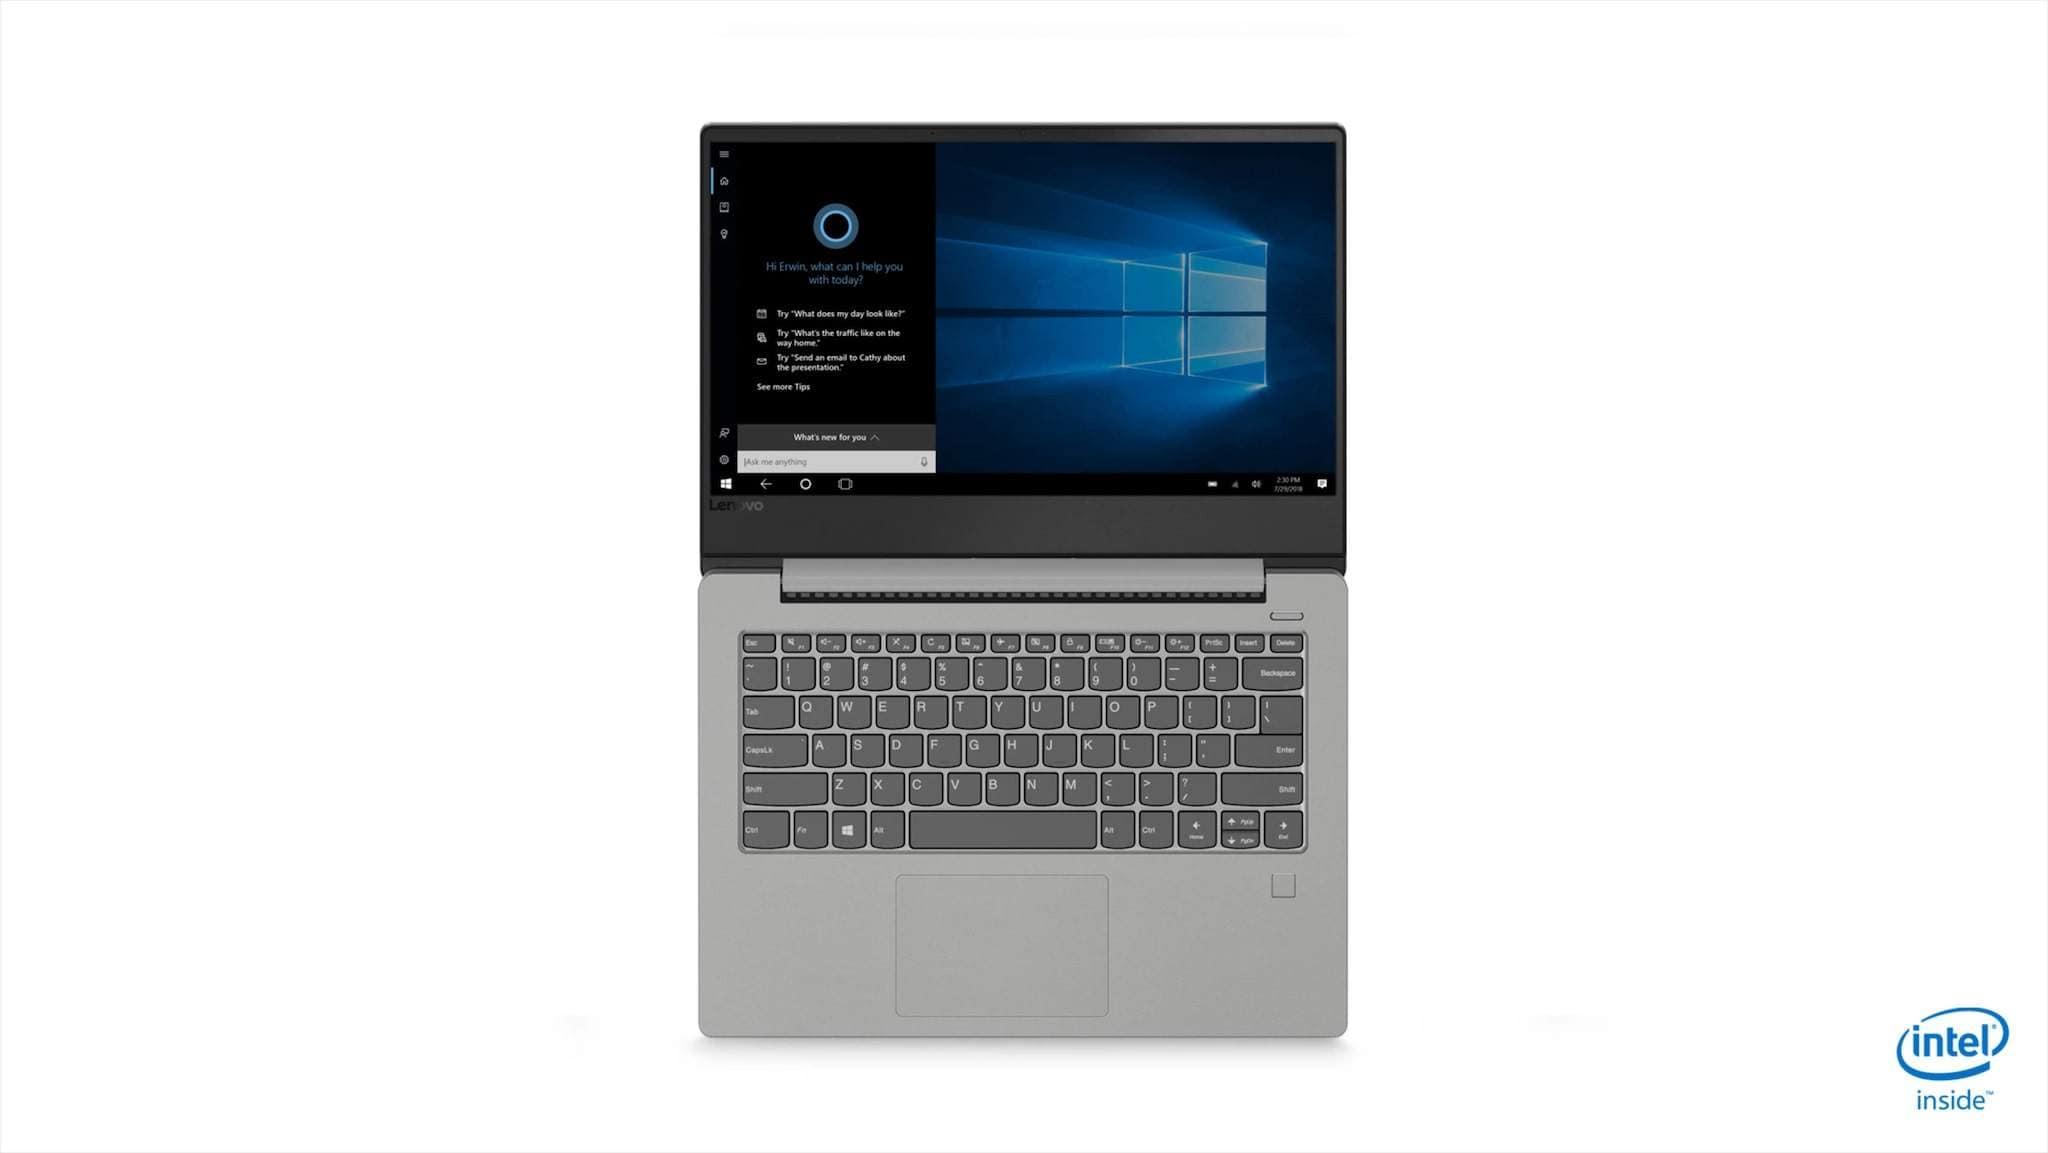 Lenovo Ideapad 330S (Core I3 - 8th Gen / 4 GB RAM / 256 GB HDD / 35.56 Cm (14 Inch) FHD / Windows 10) 81F400GUIN Thin And Light Laptop (Platinum Grey  1.67 Kg)